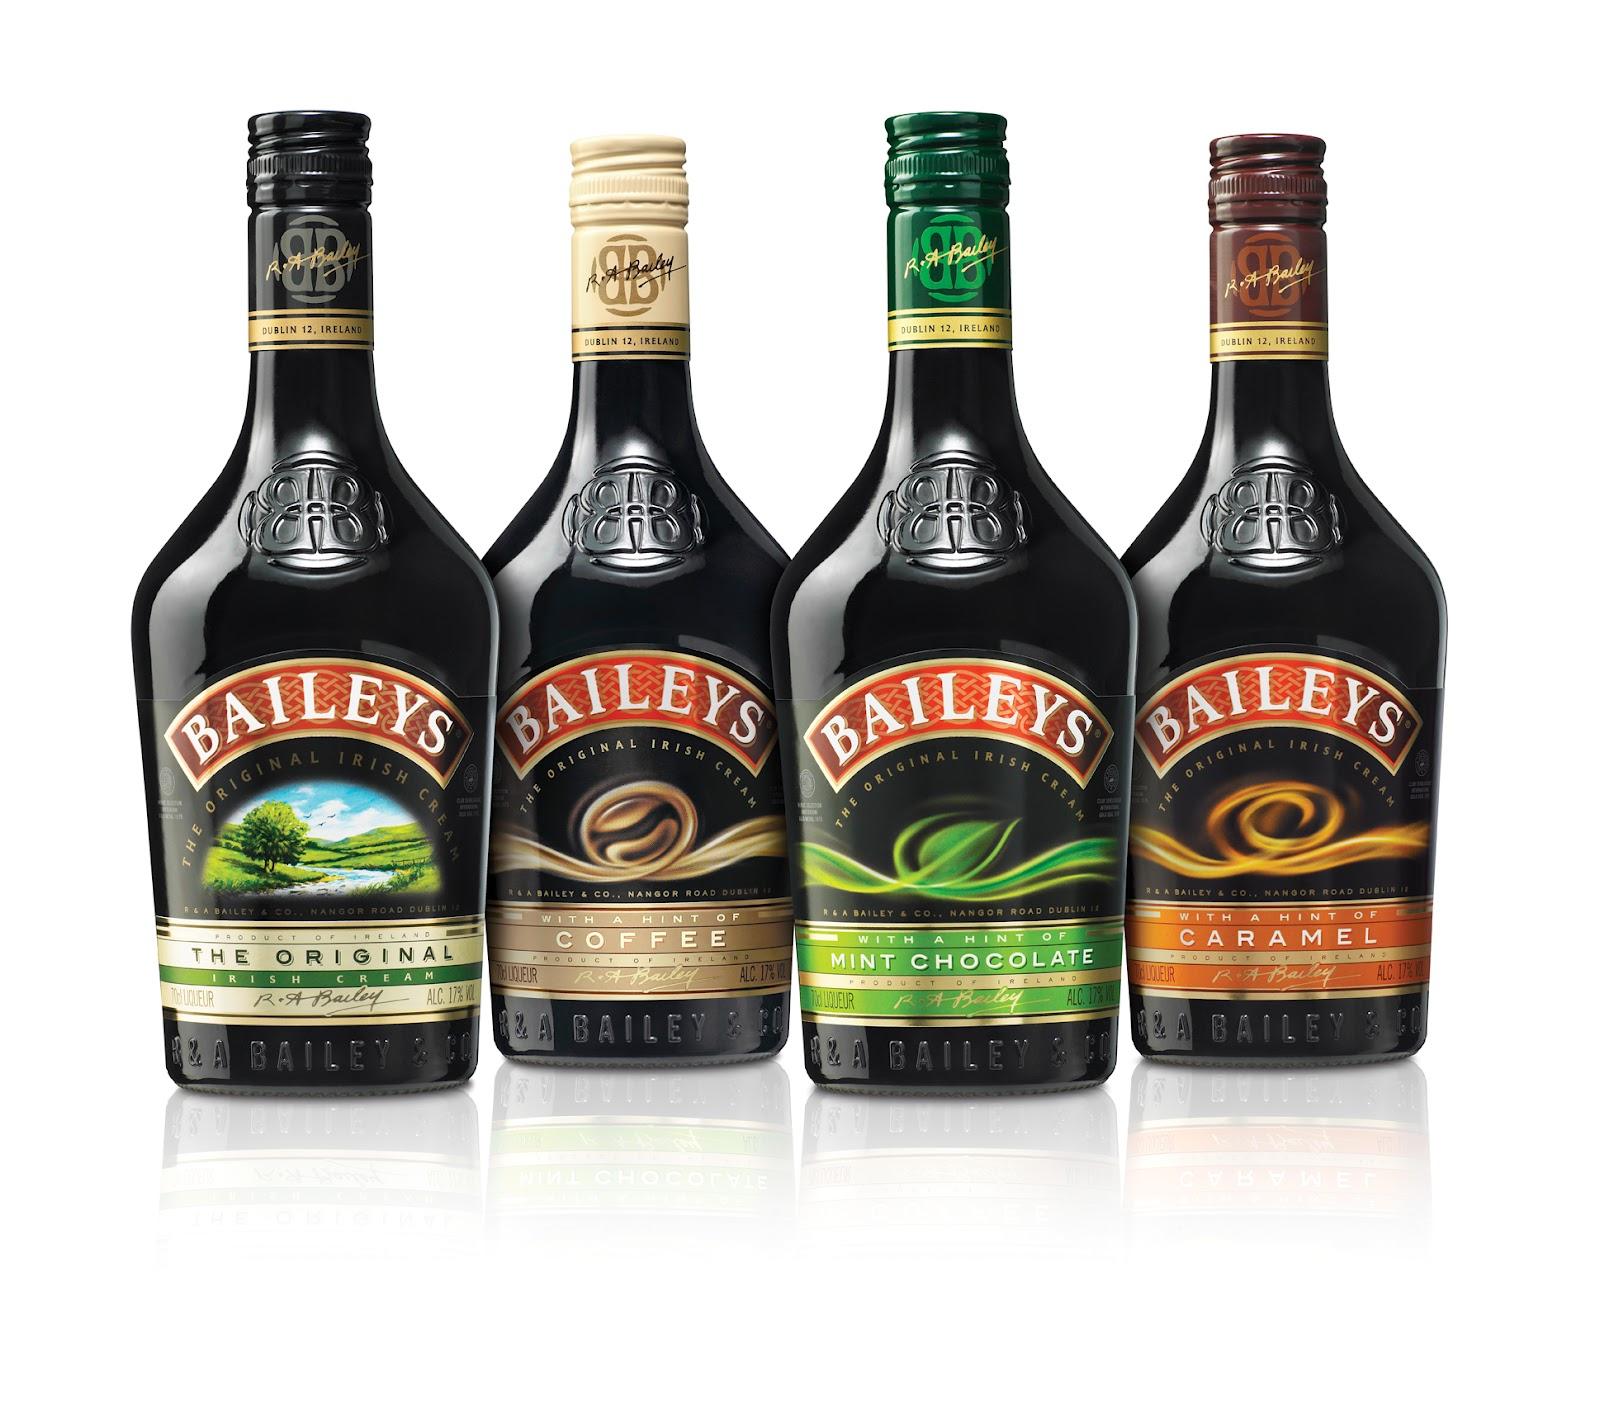 Wedding Spirits With Bailey's Irish Cream